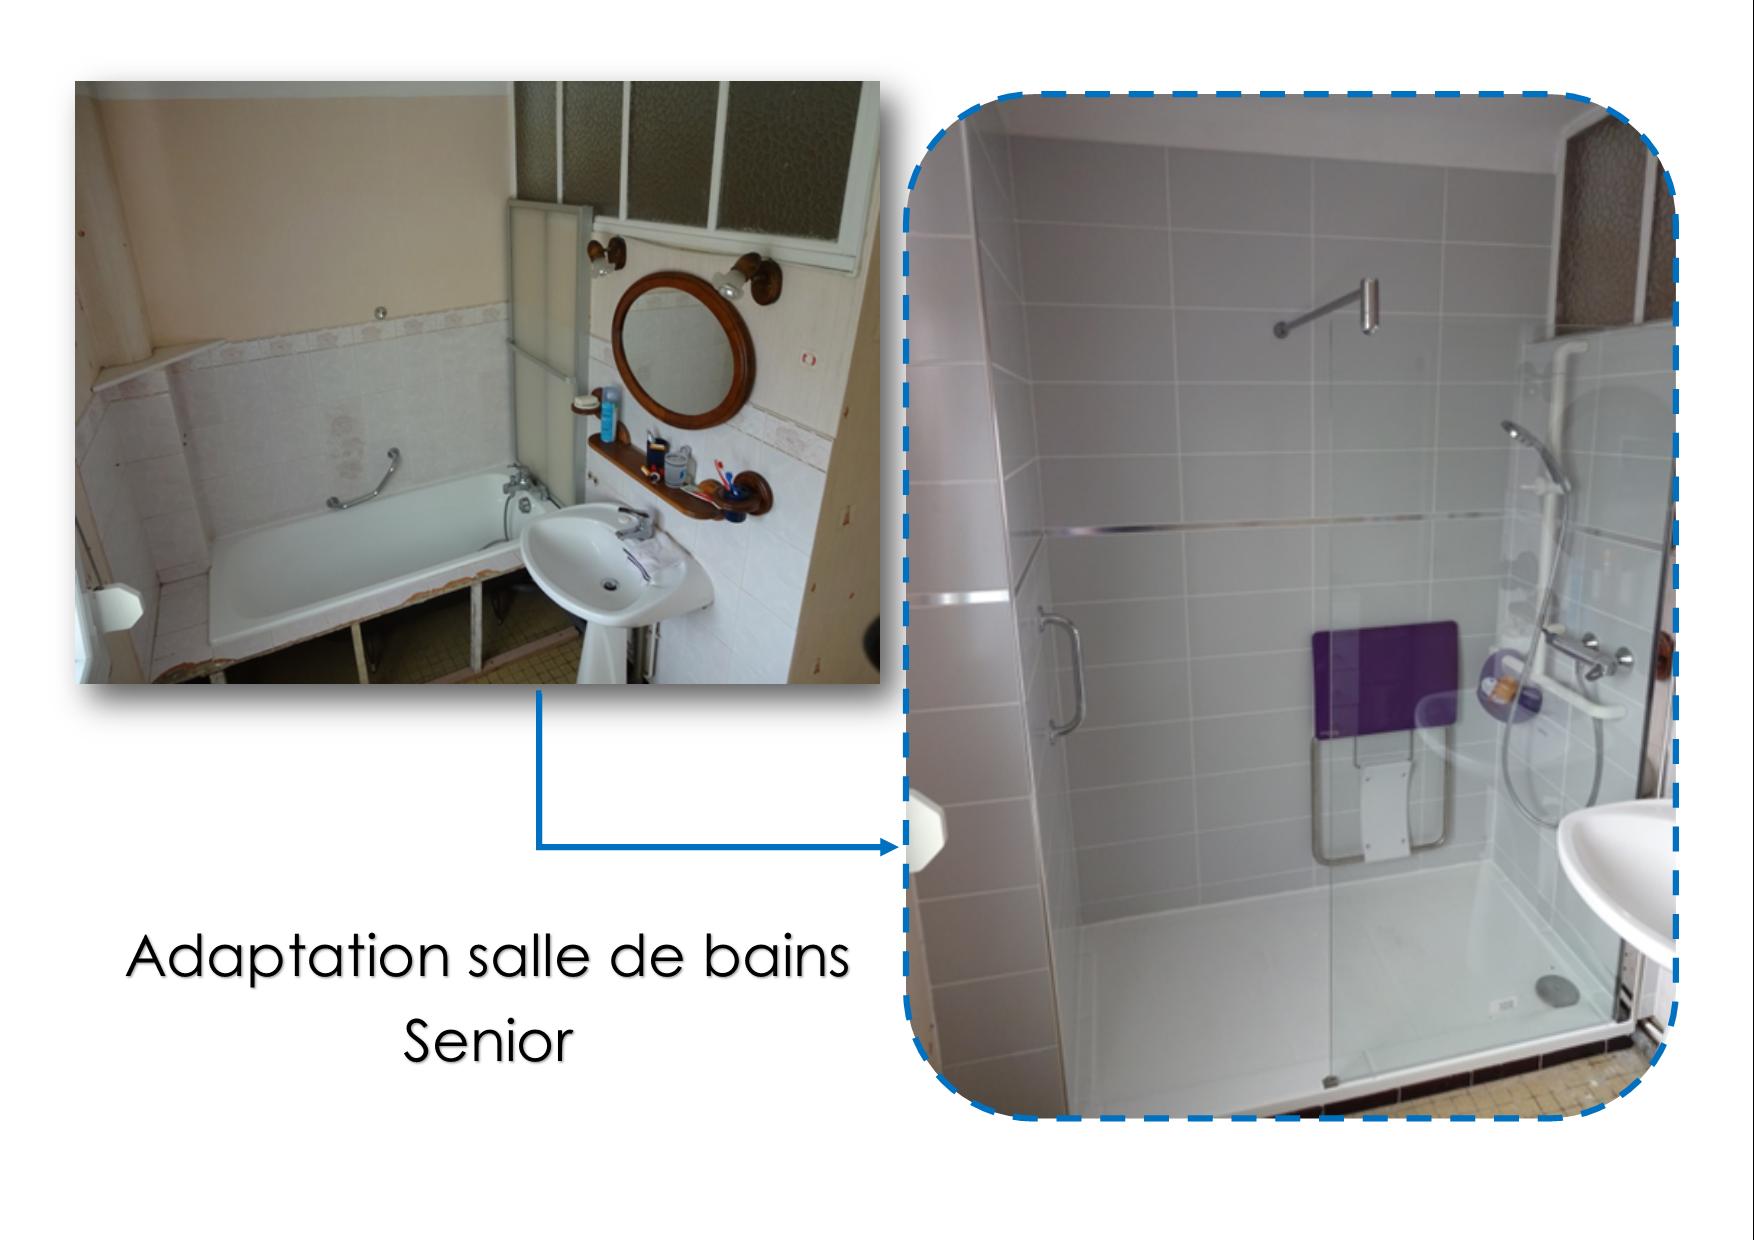 Adaptation salle de bain senior